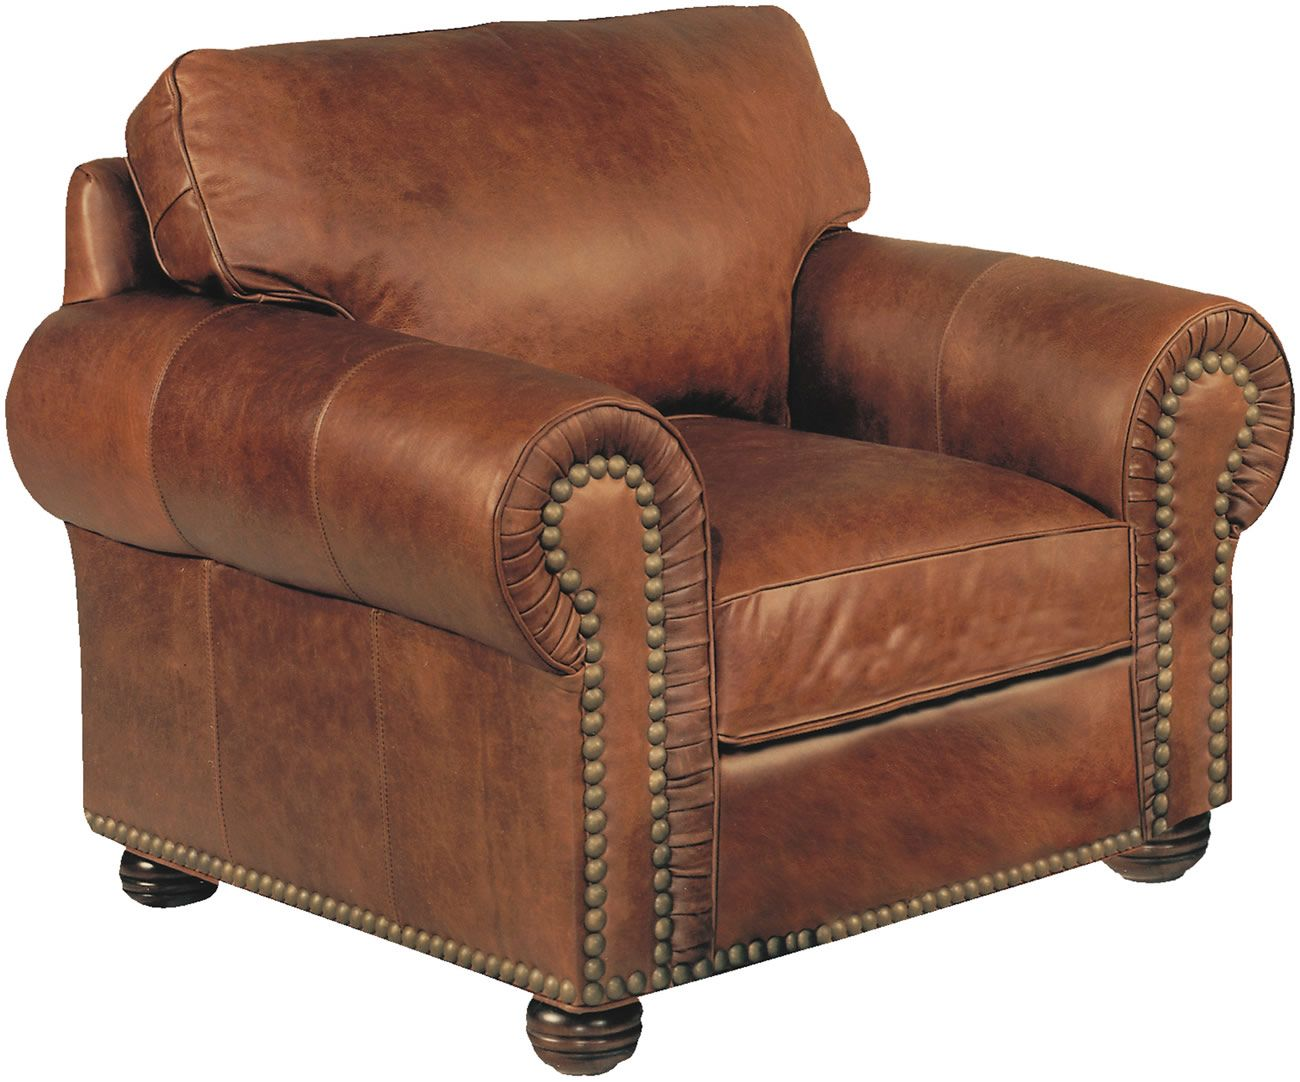 nailhead trim leather sofa set brown colour schemes stickley hutchinson chair with